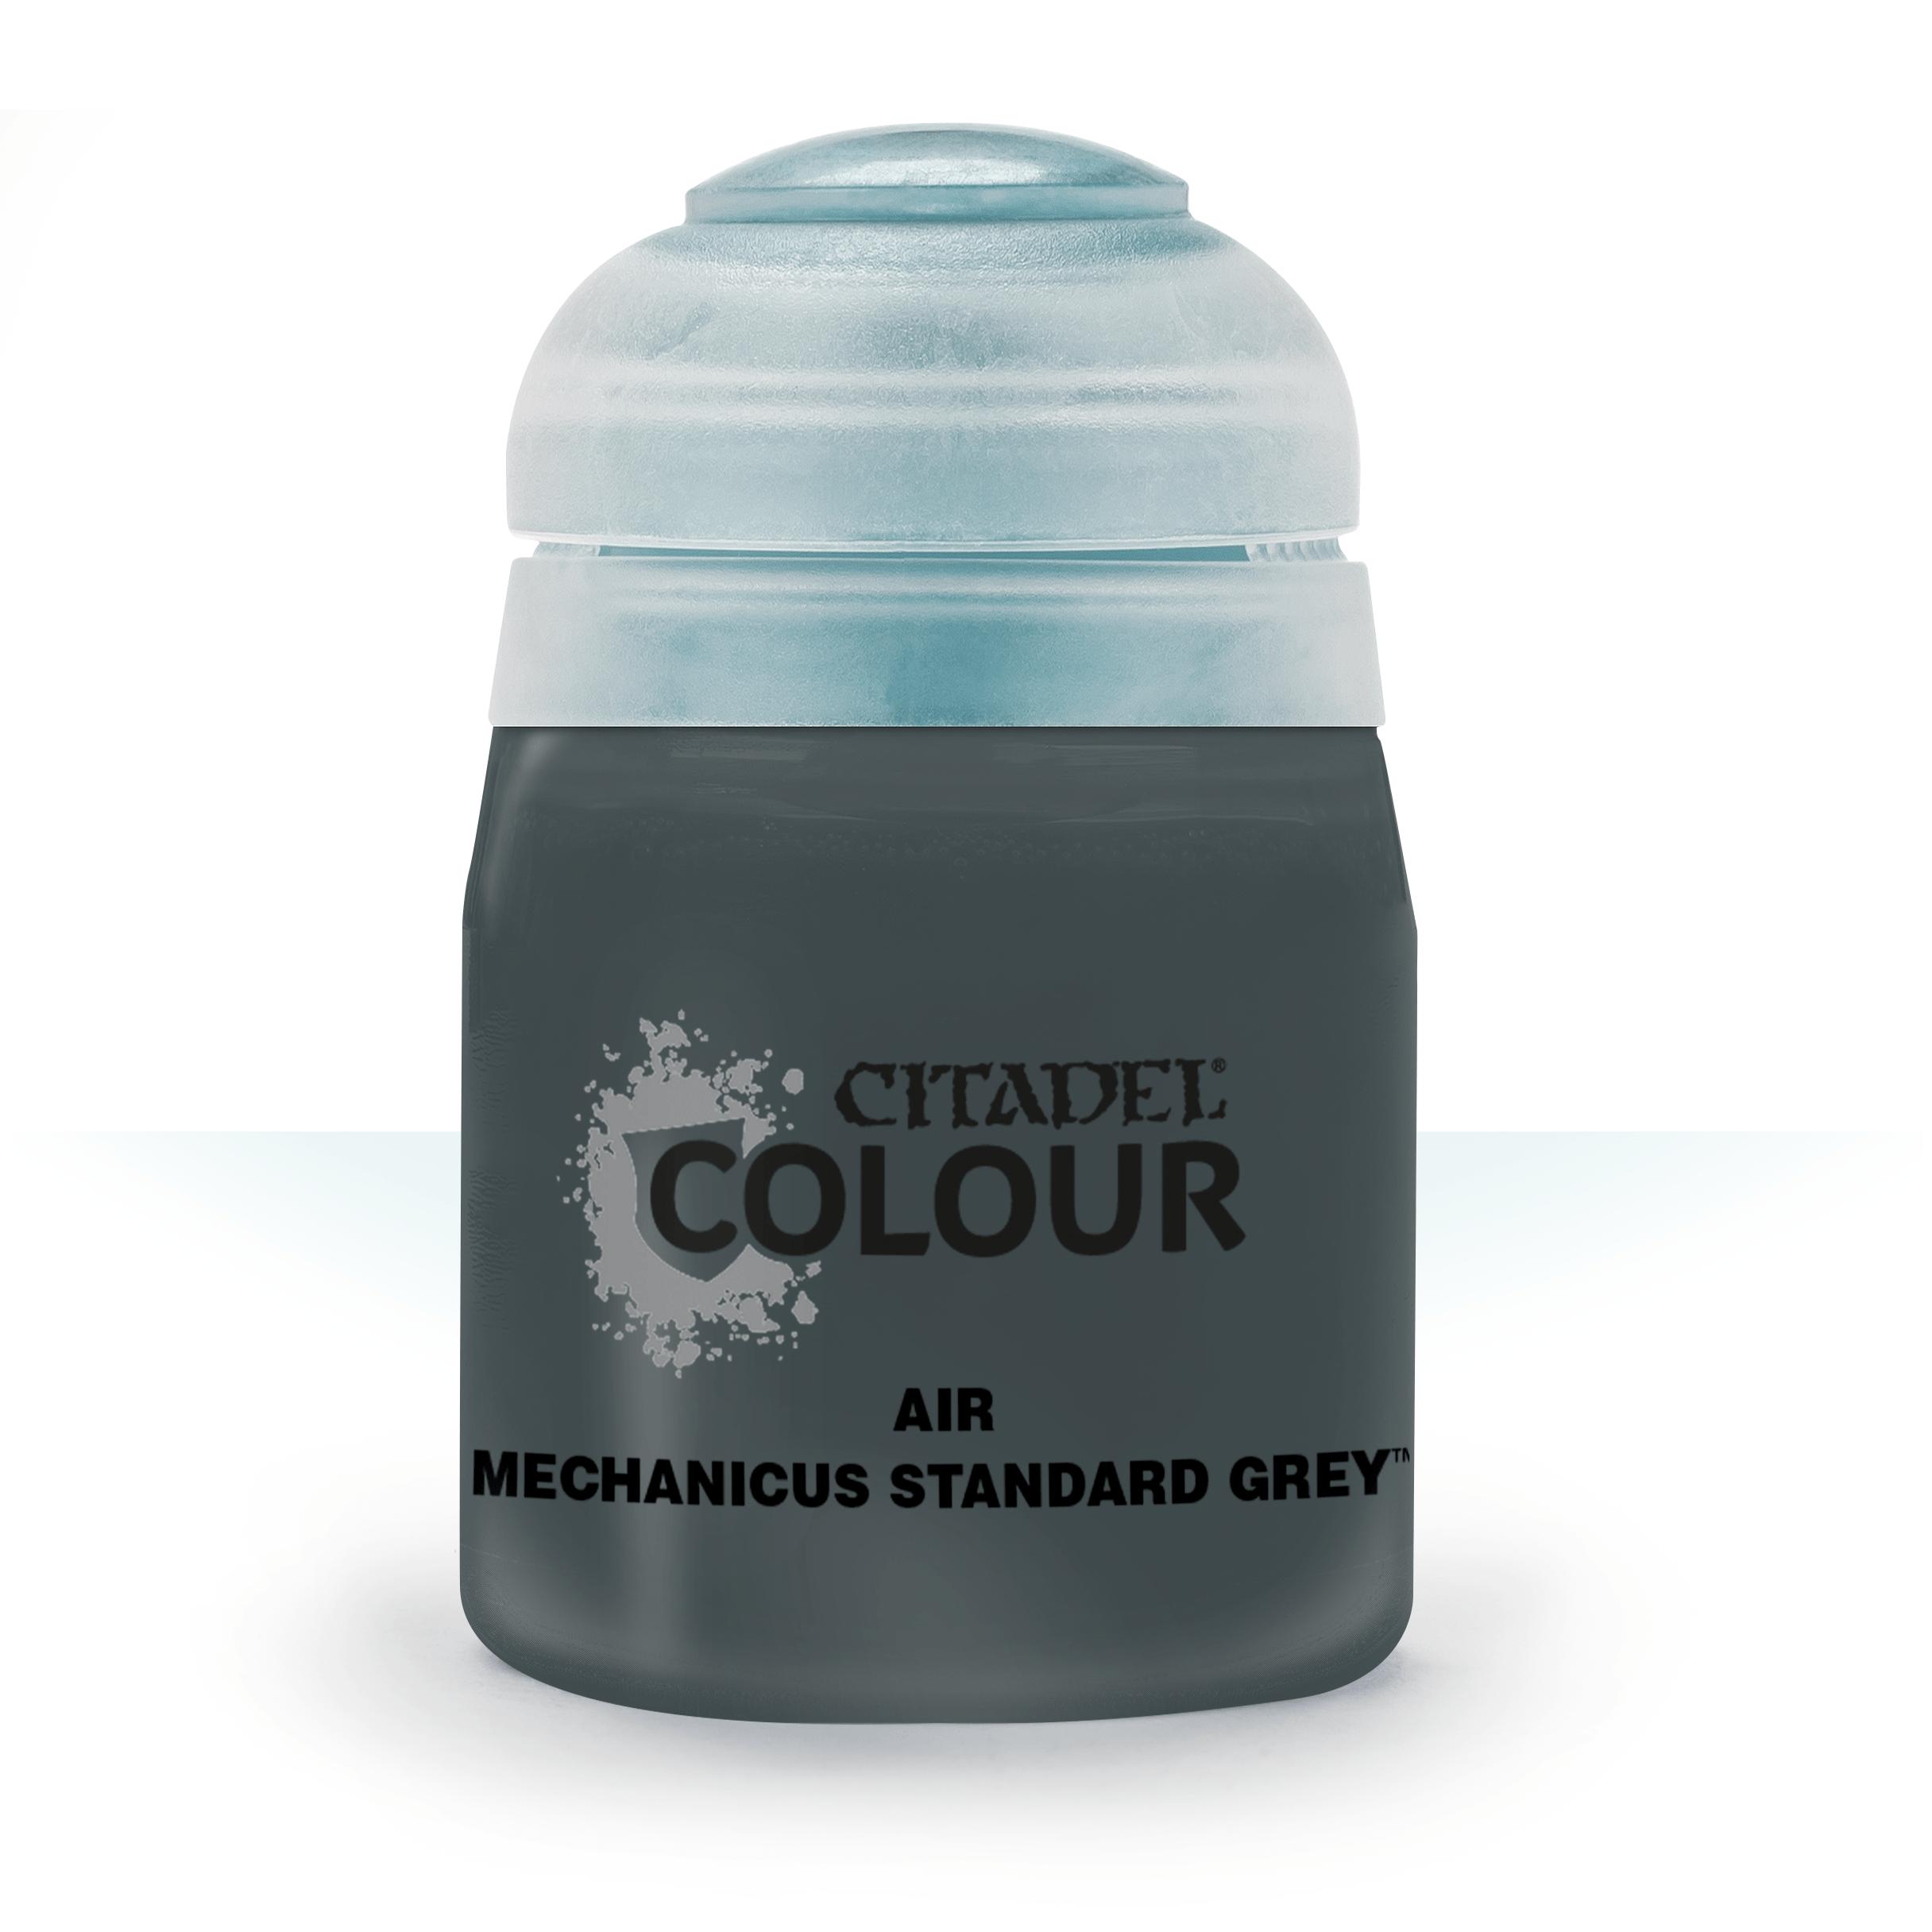 Mechanicus Standard Grey, Citadel Air 24ml